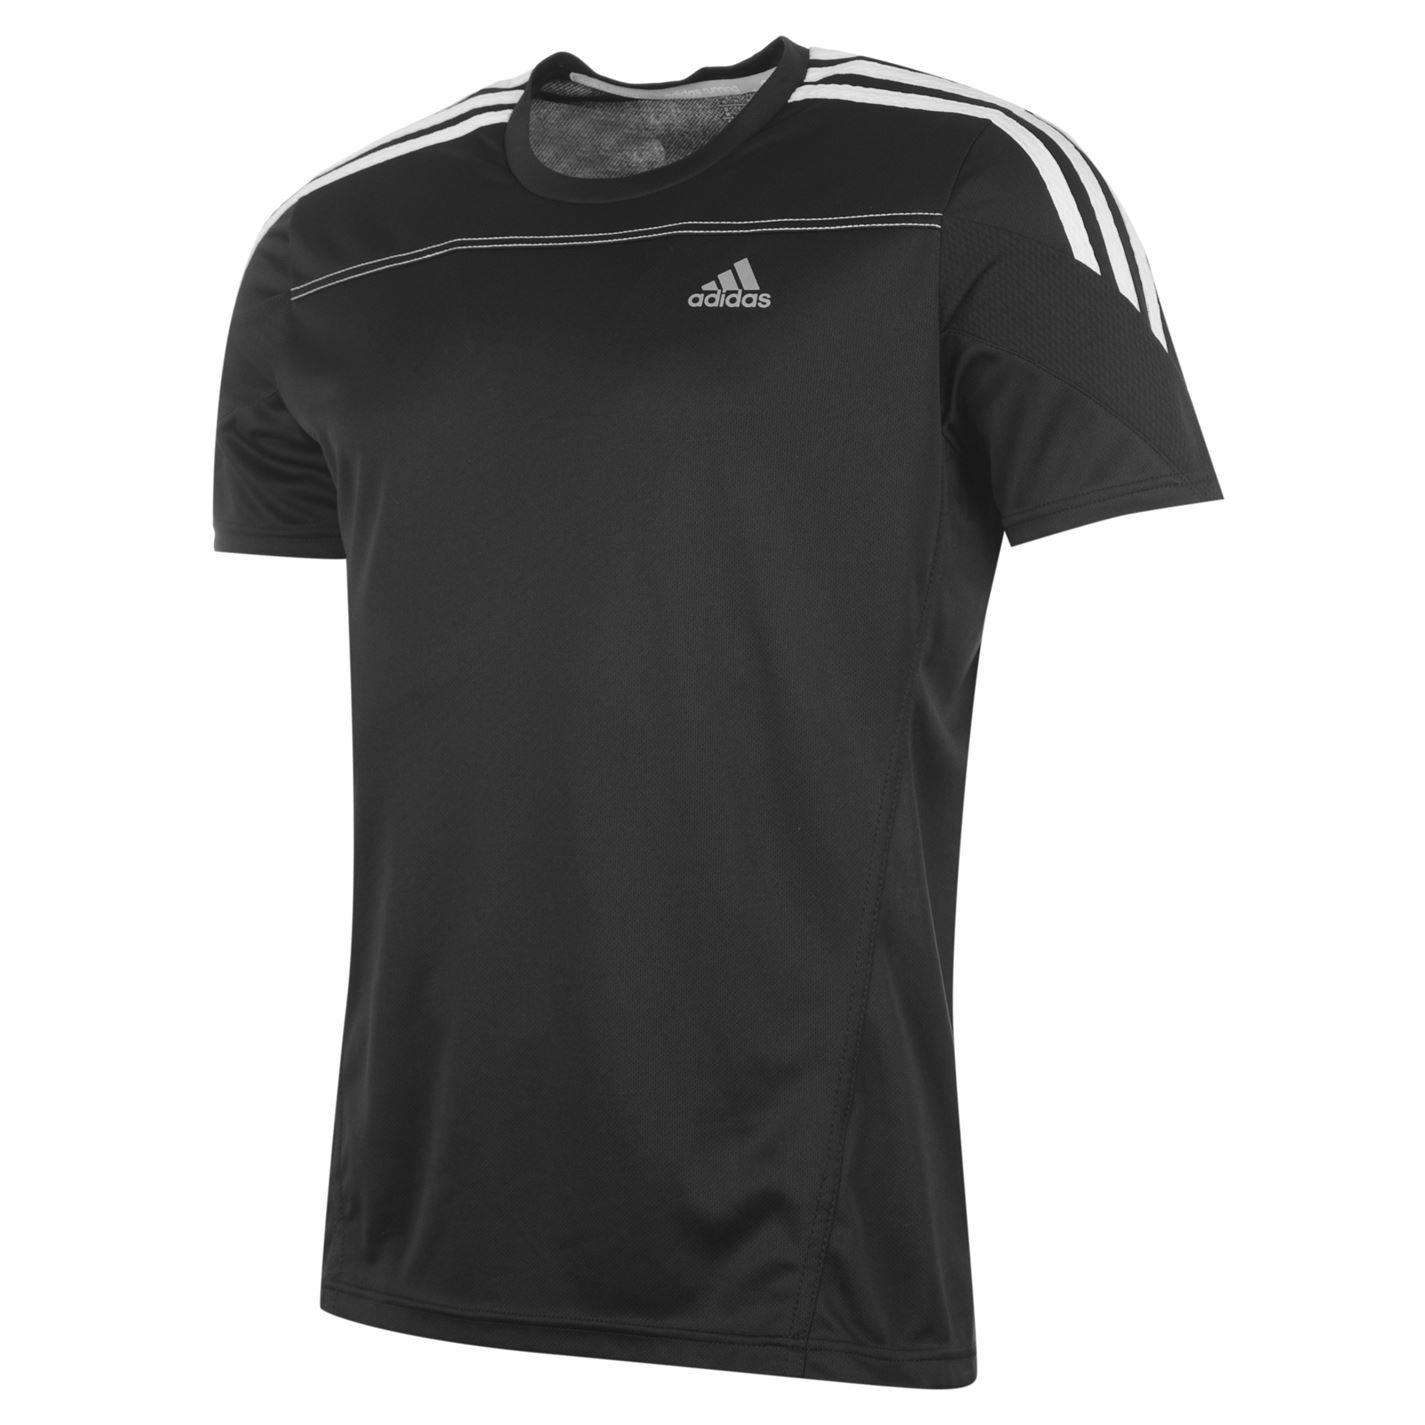 Adidas rsp ss t shirt mens black white top tee tshirt ebay for Best white t shirt mens